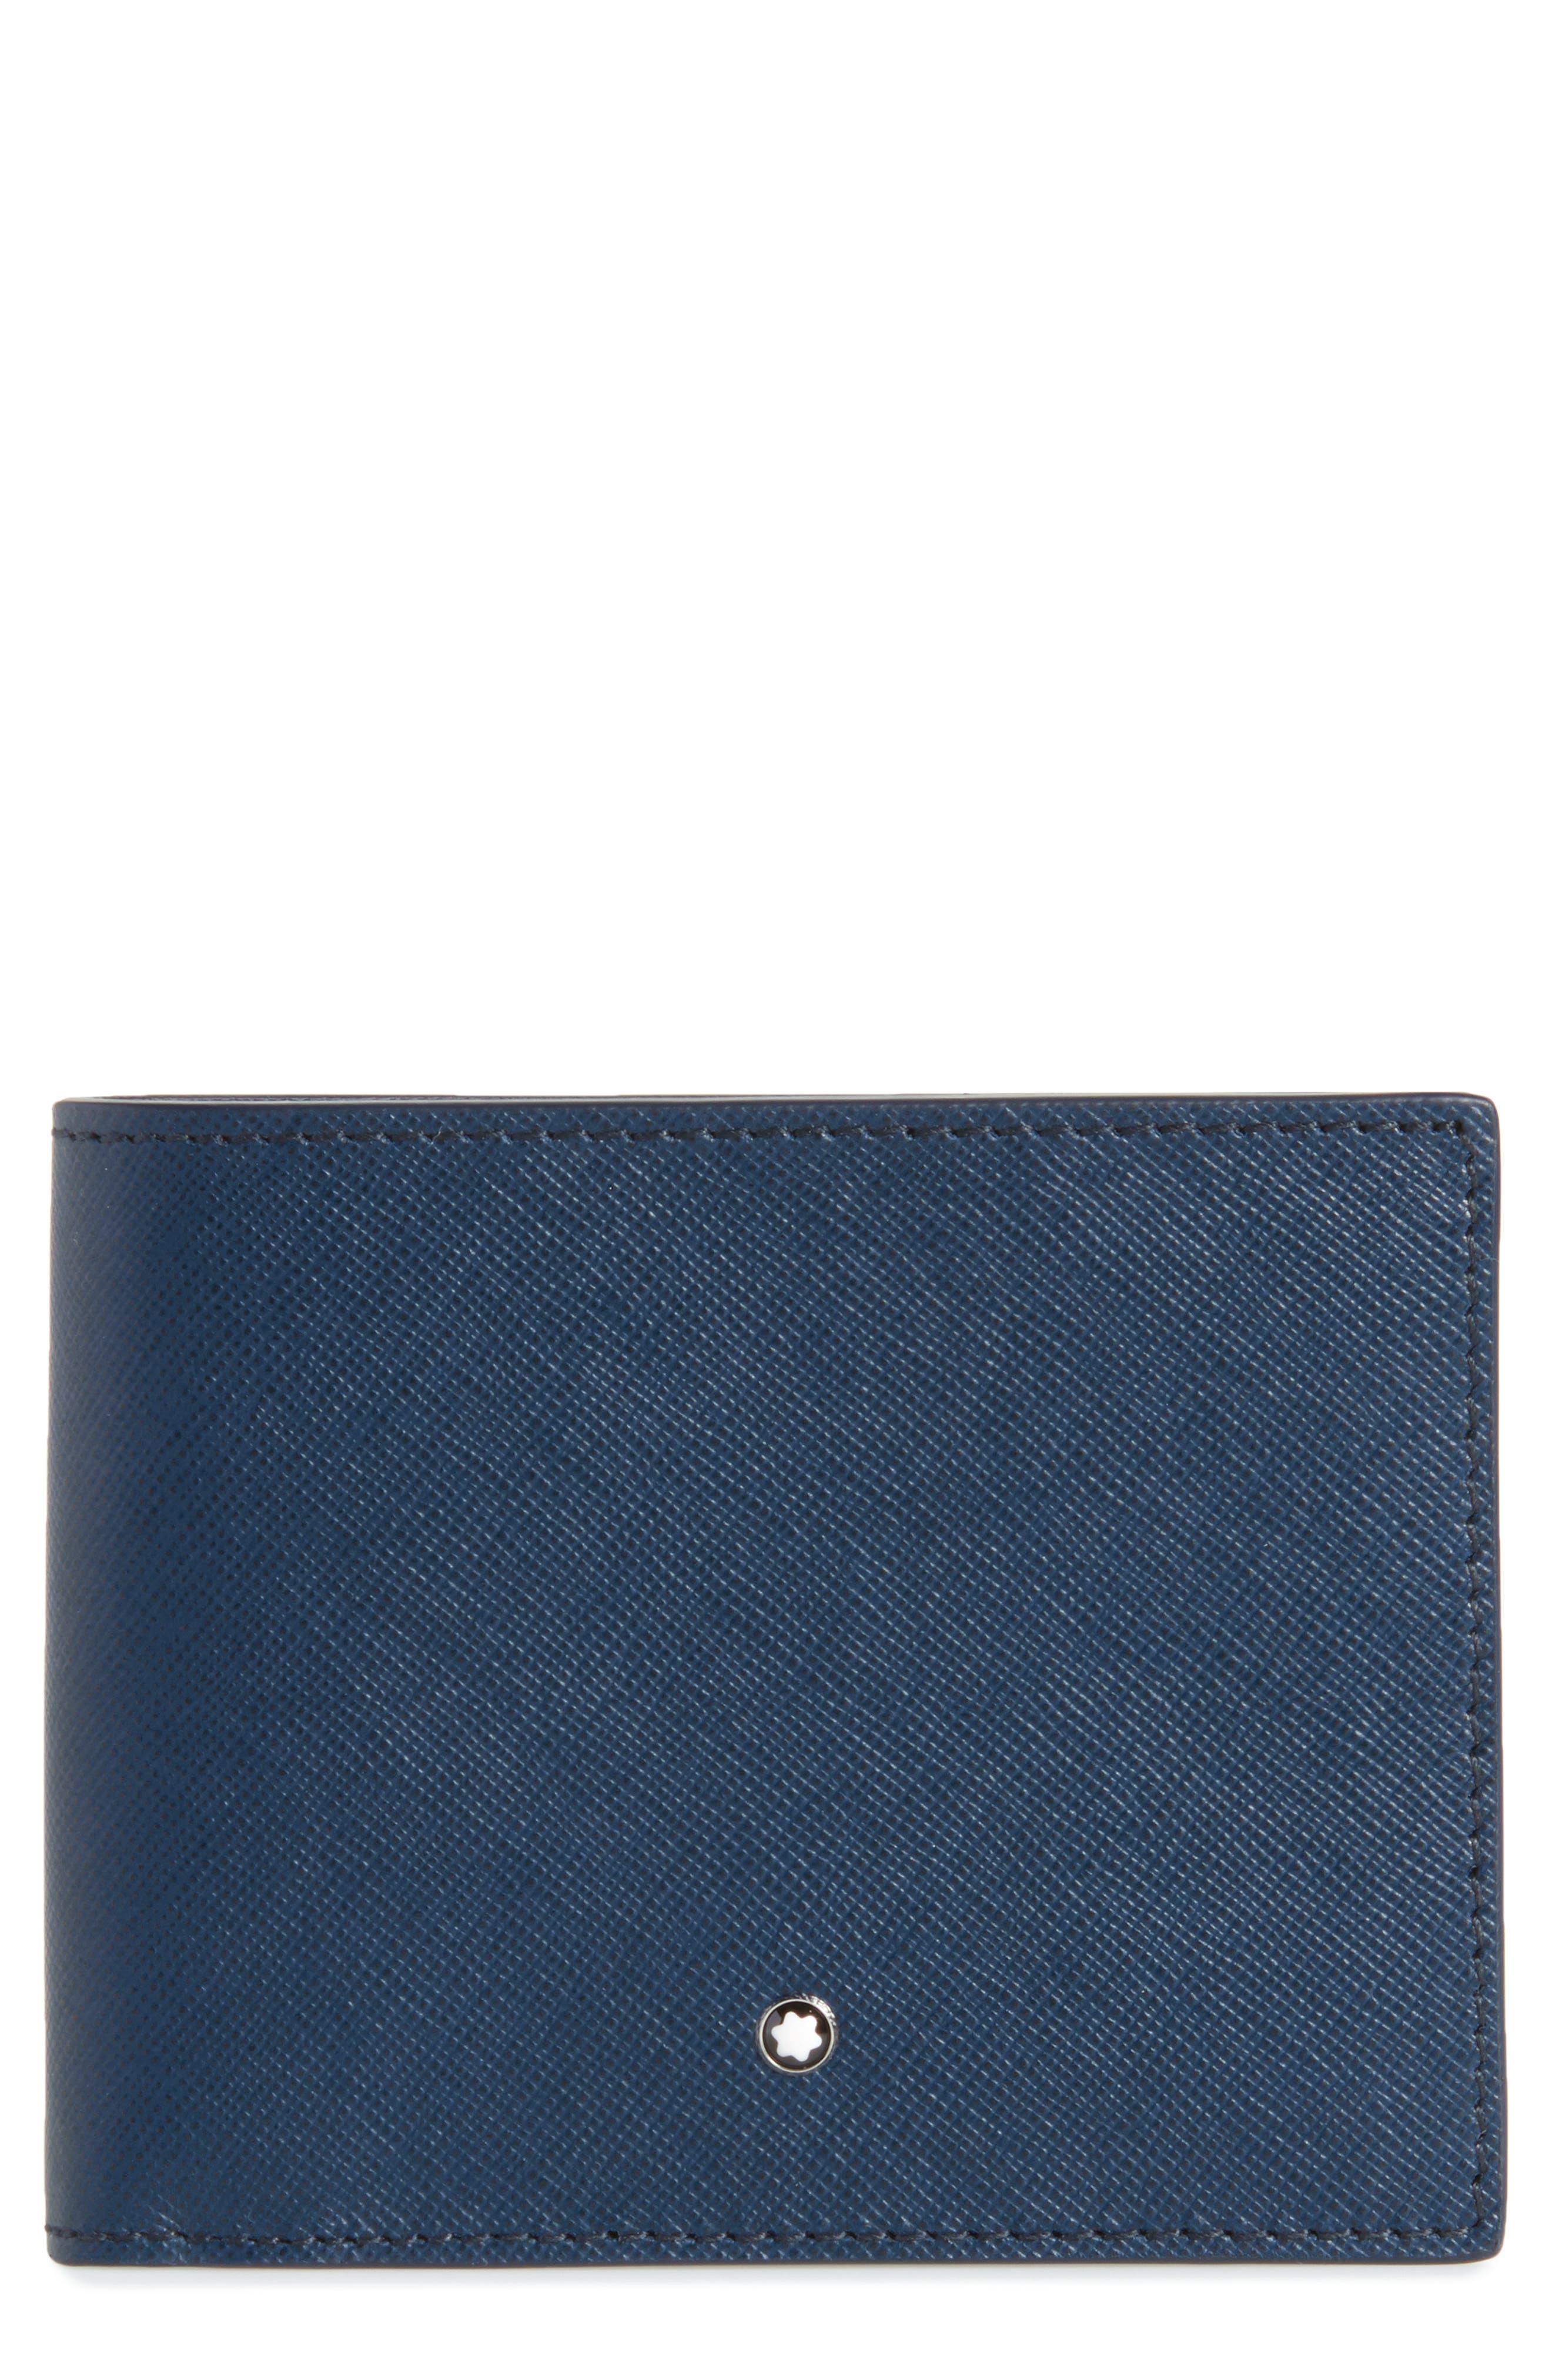 Main Image - MONTBLANC Sartorial Leather Bifold Wallet